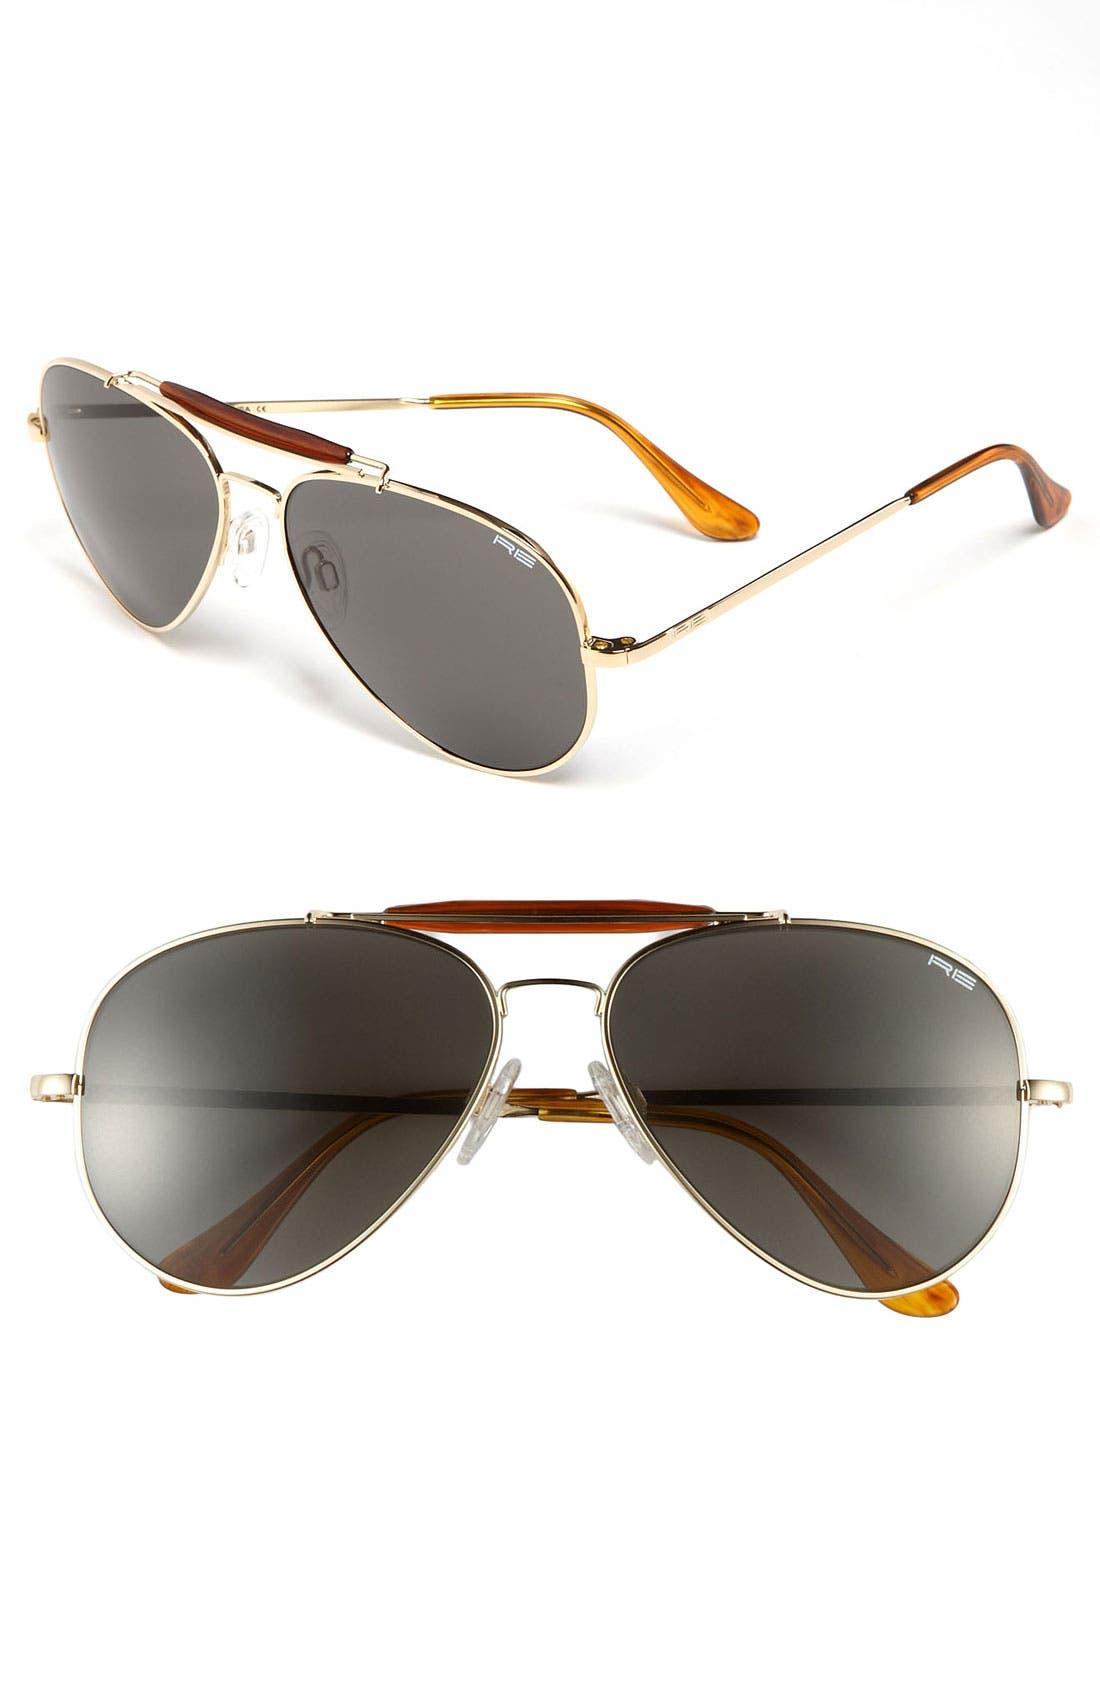 Main Image - Randolph Engineering 'Sportsman' 61mm Sunglasses